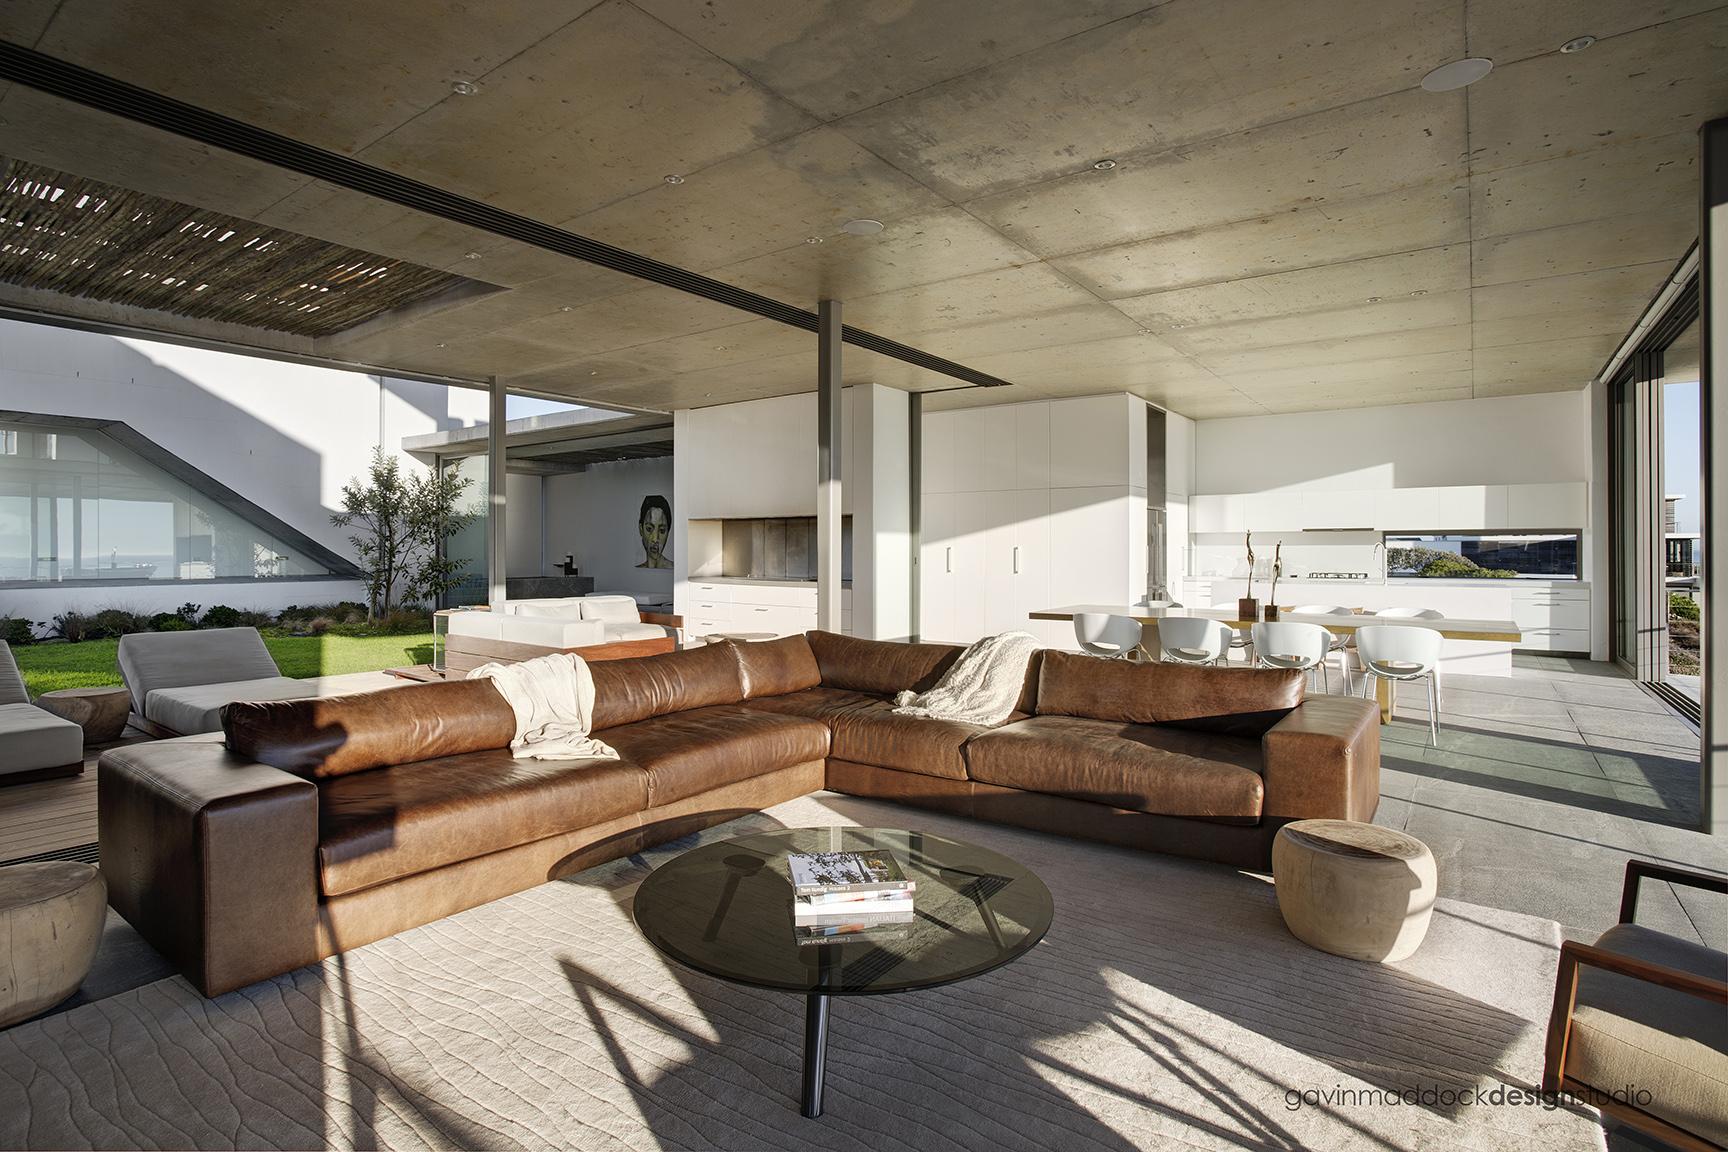 Pearl bay residence by gavin maddock design studio for Gavin interior design jakarta